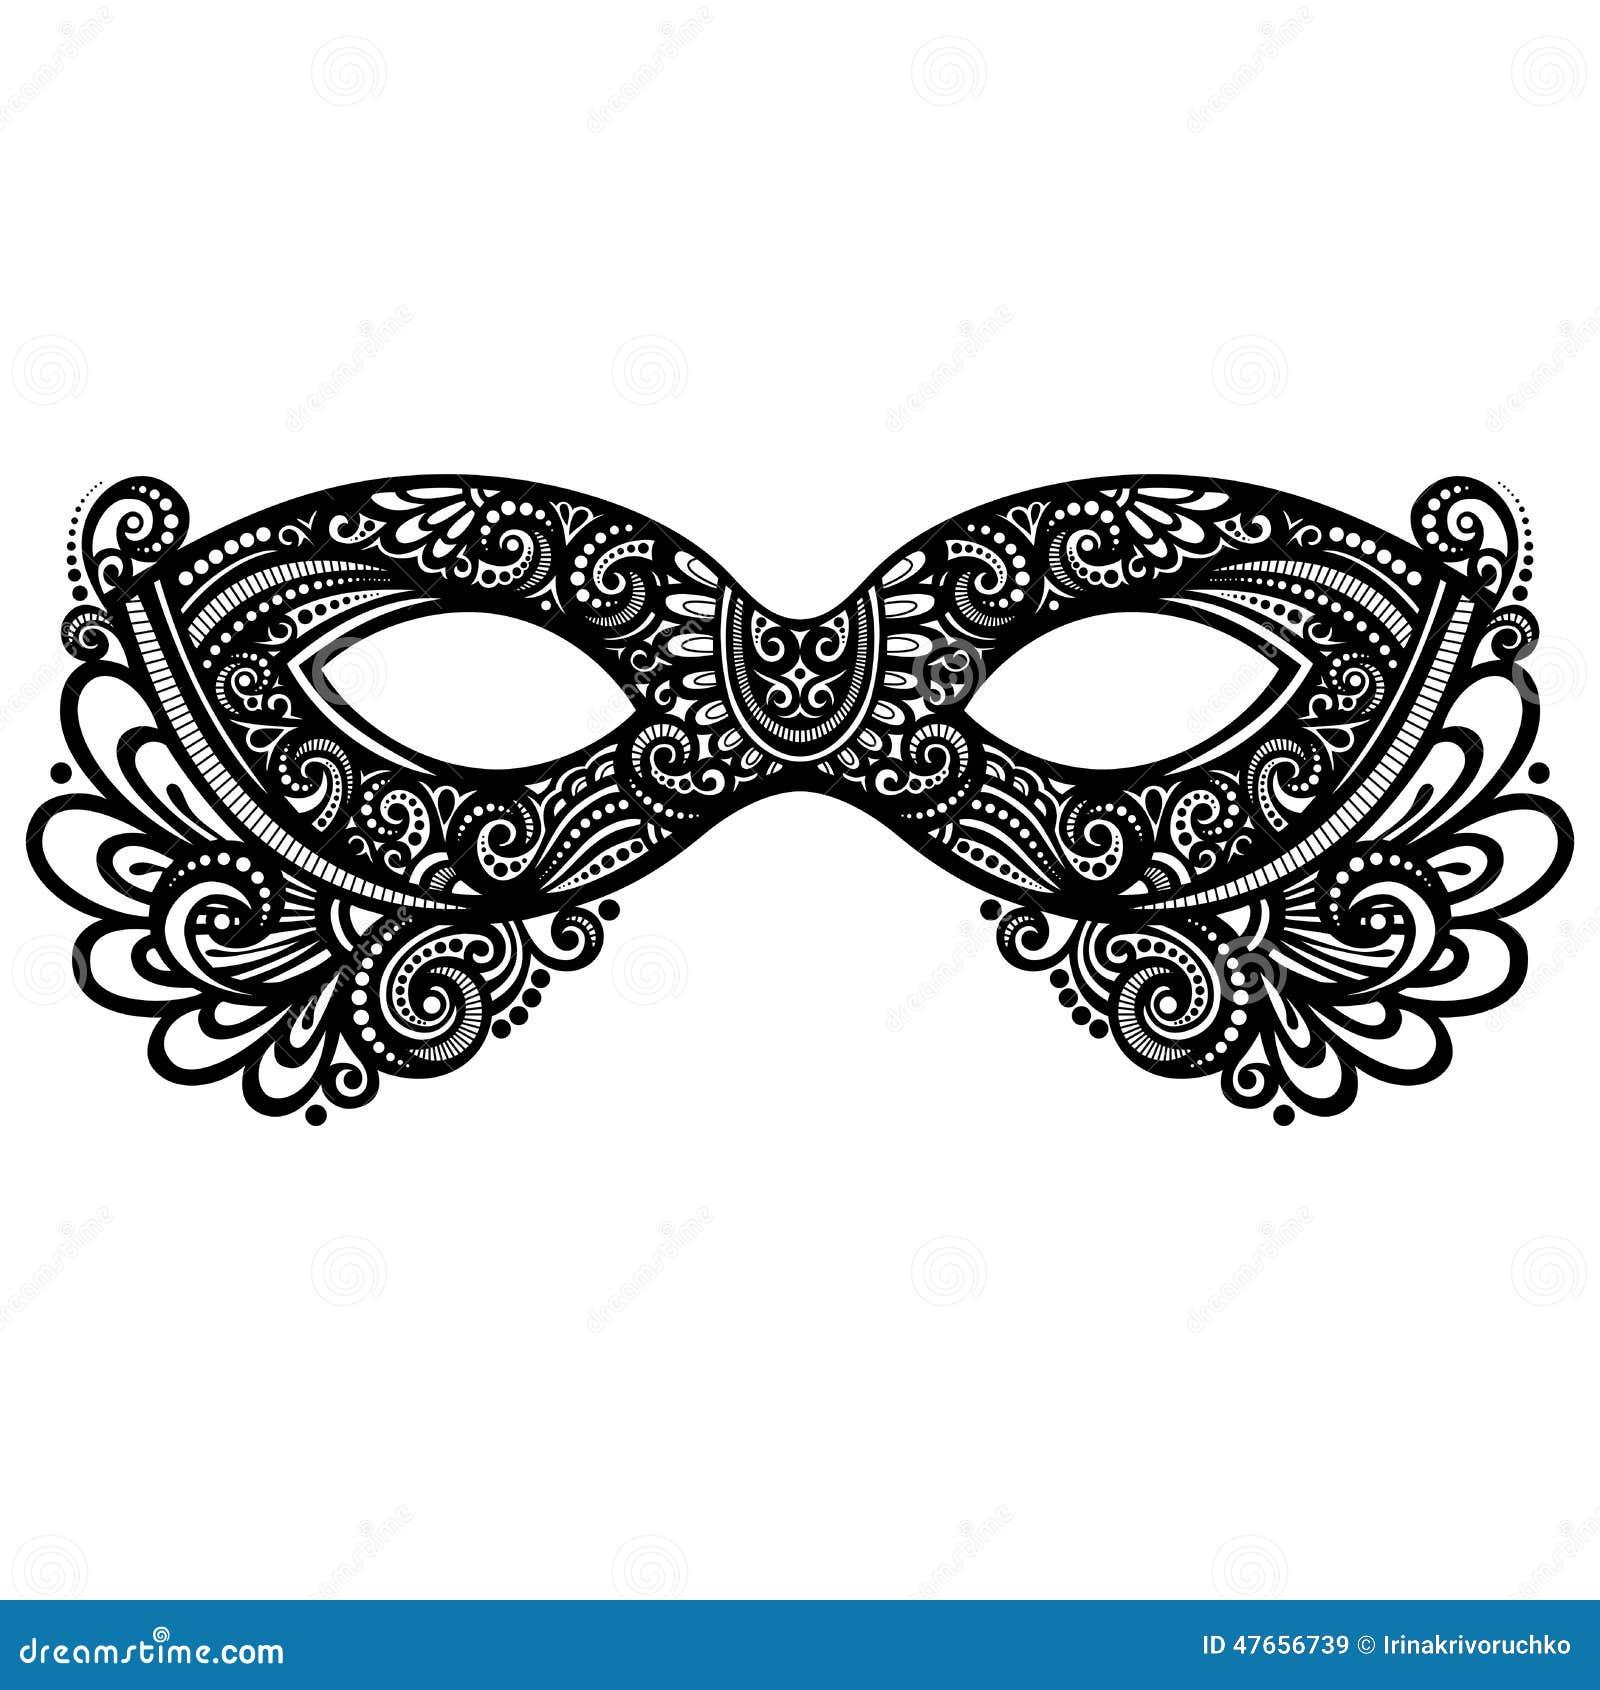 Funky Masquerade Mask Template Free Motif - Resume Template Samples ...